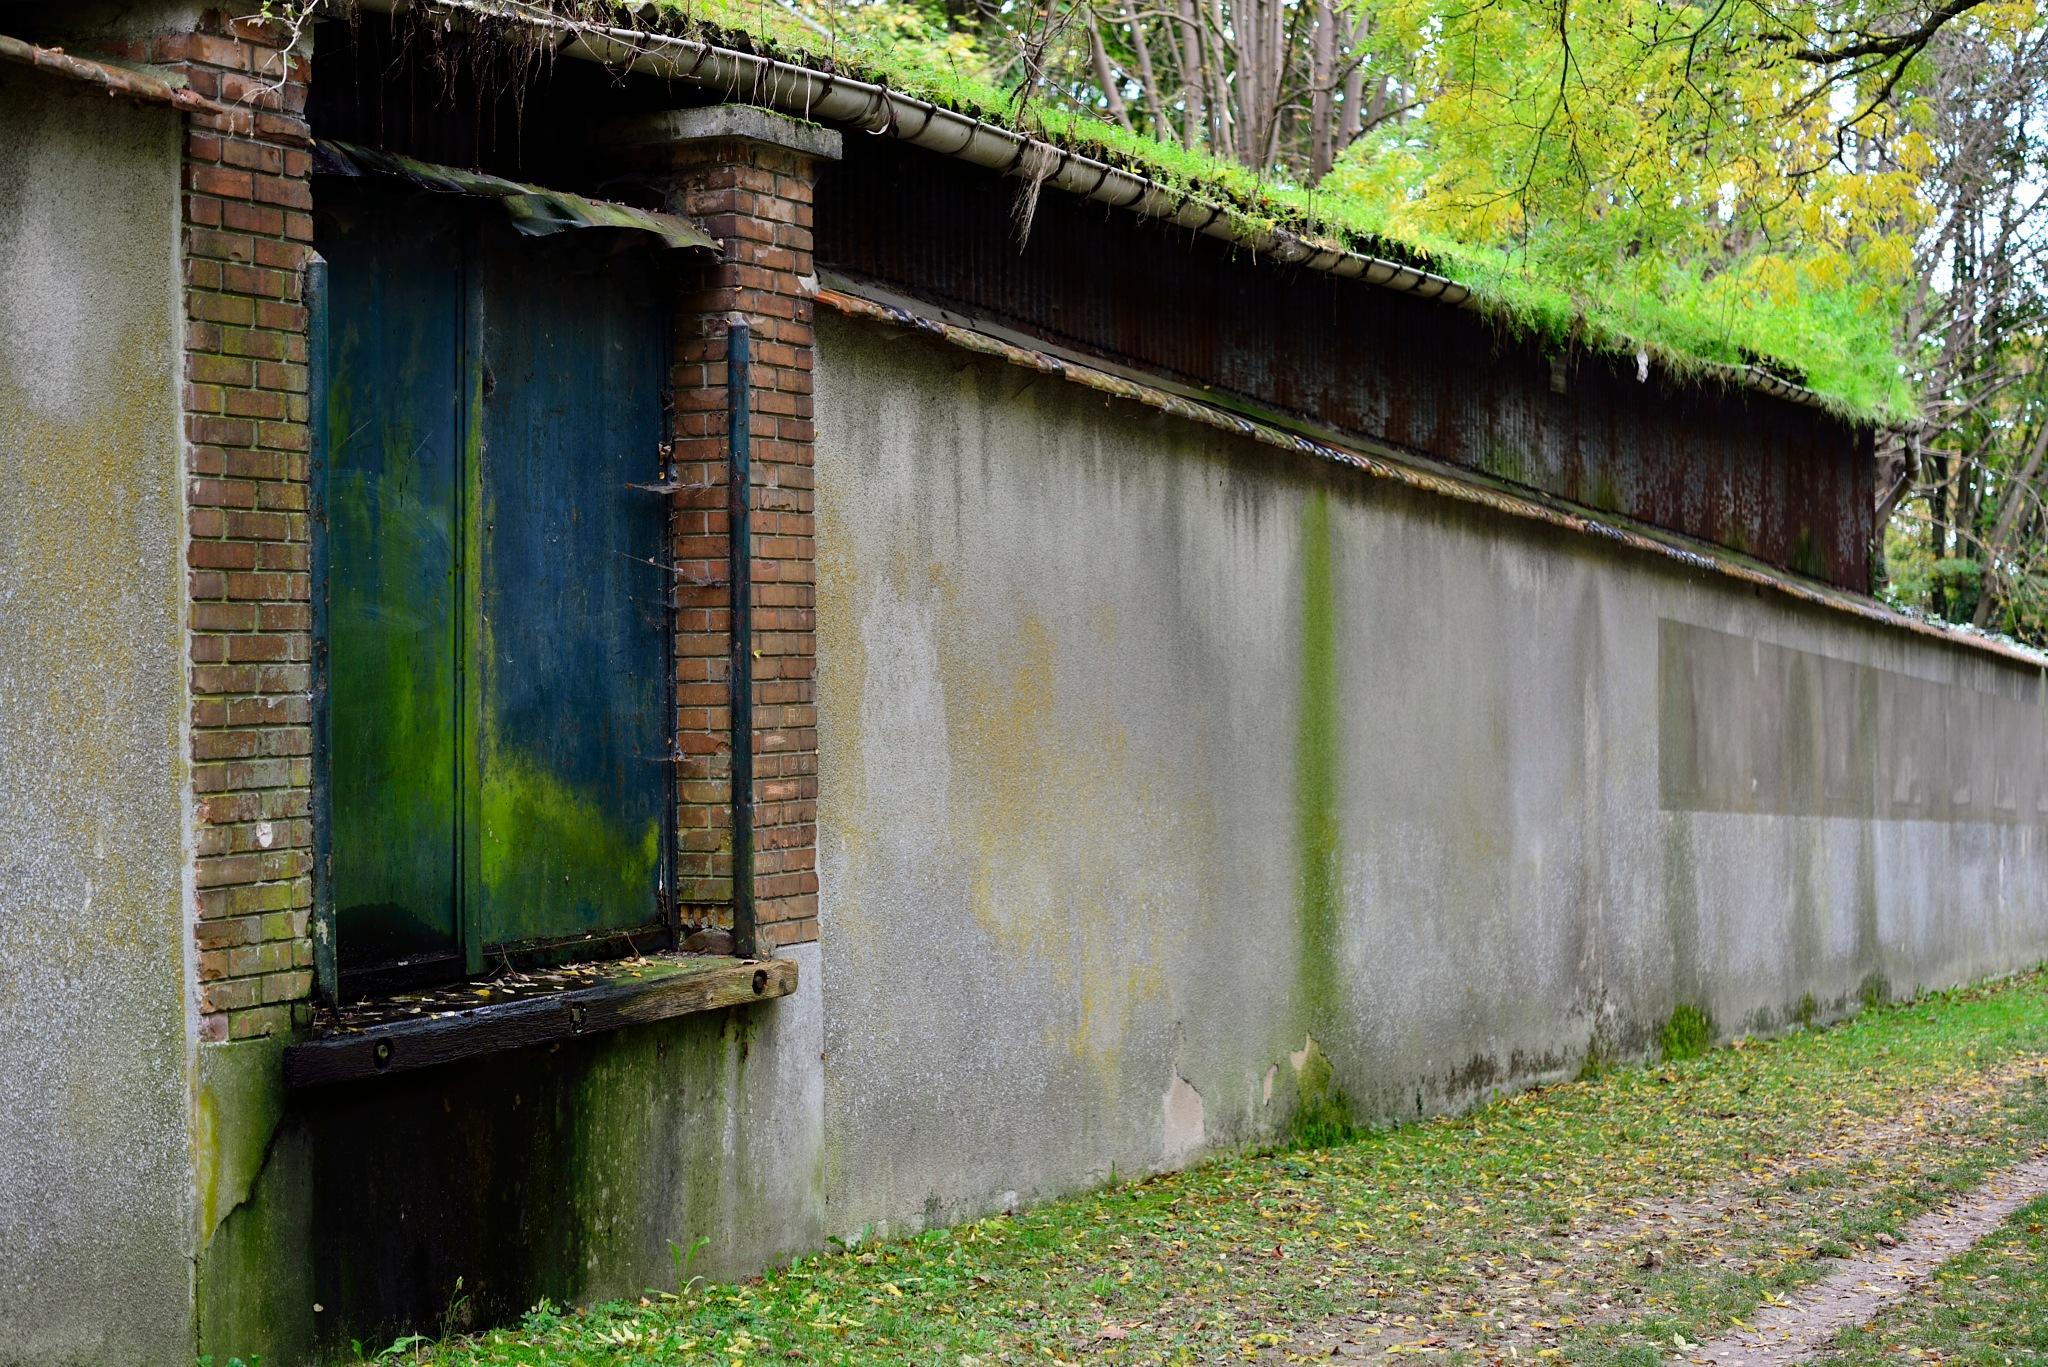 Mur d'enceinte en automne by trsor7